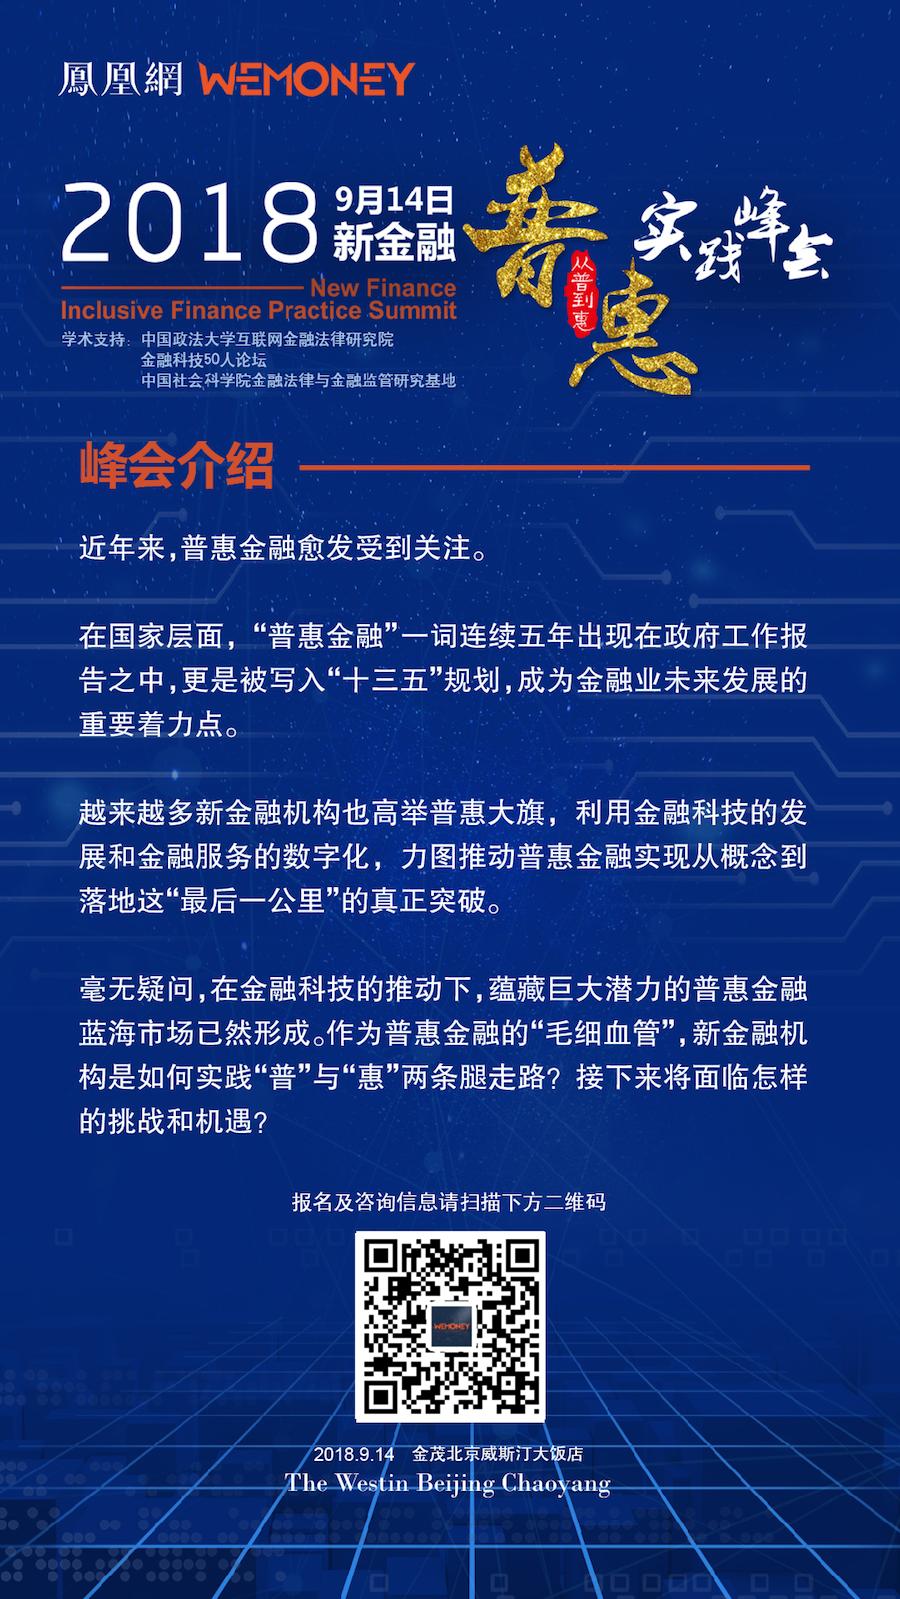 WEMONEY晚报:北京互金协会正式启动P2P自律检查;深圳年内冻结电信诈骗超3亿